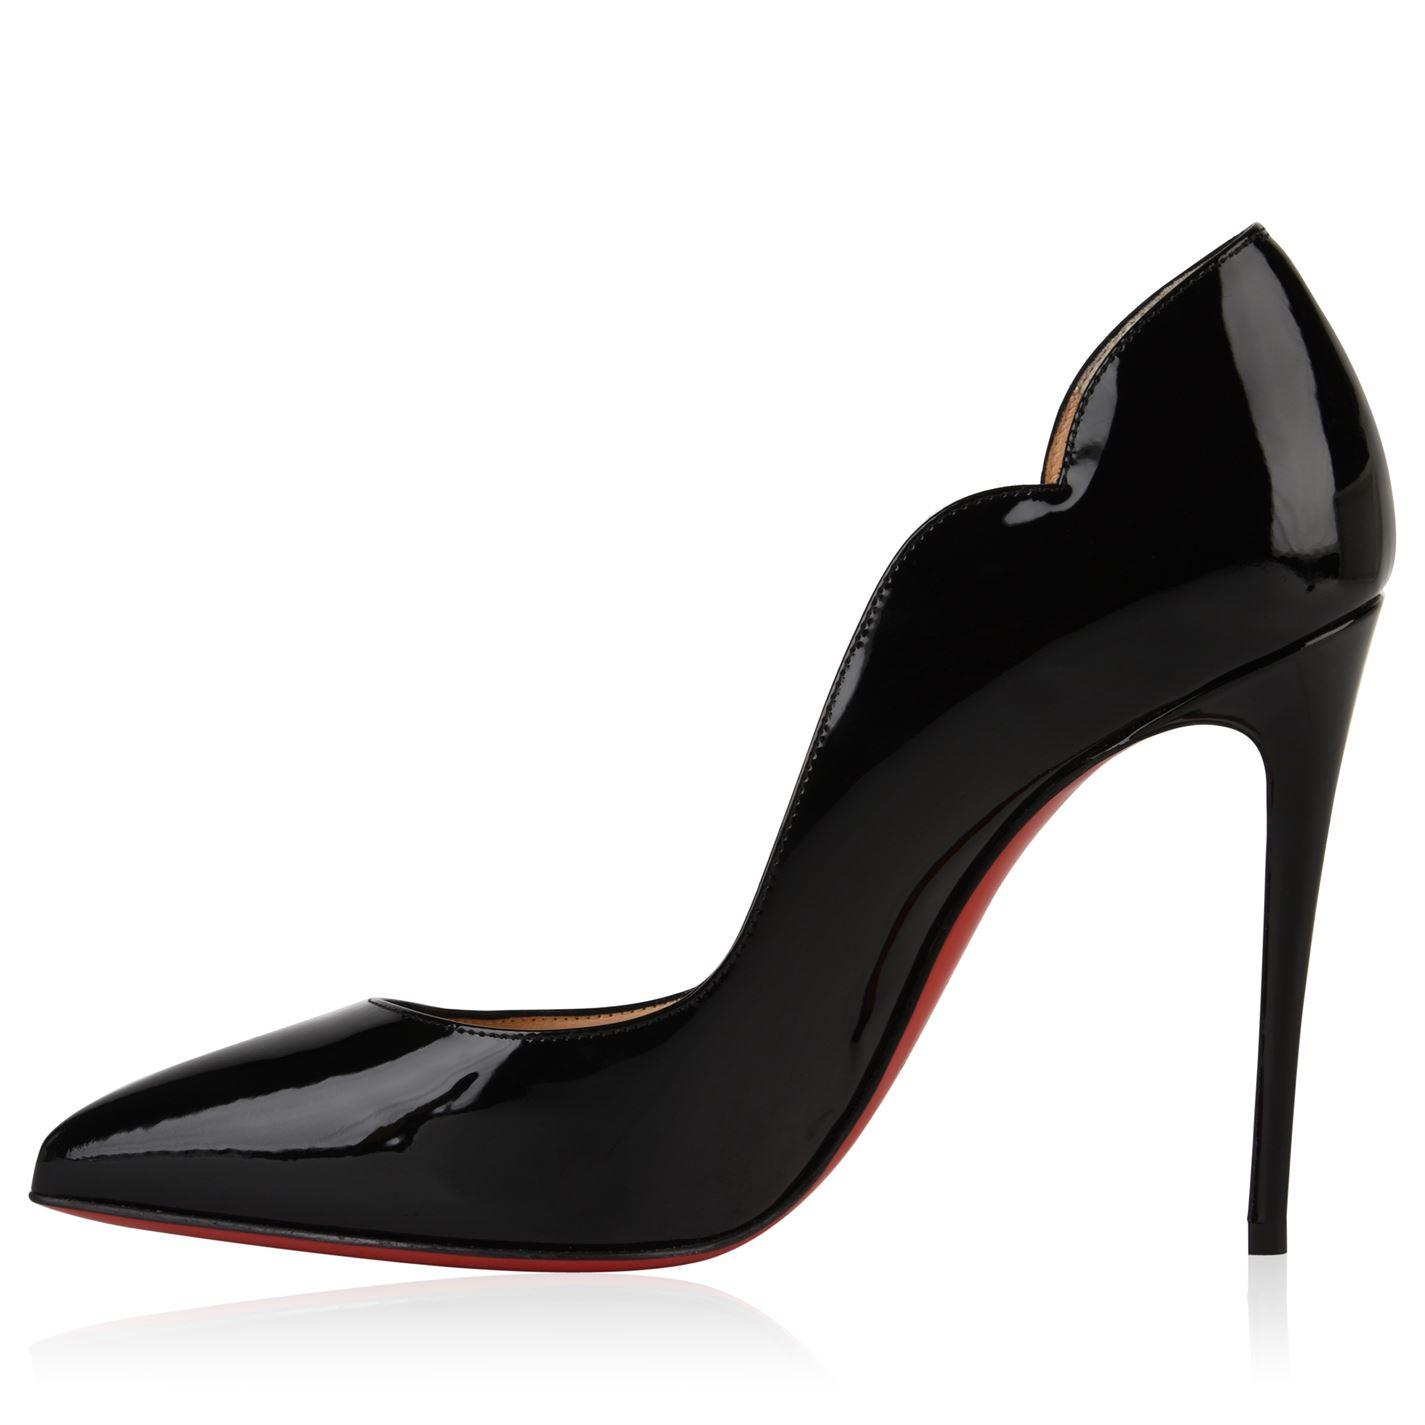 5a8d7e2f49e Christian Louboutin - Black Patent Hot Chick Heels - Lyst. View fullscreen